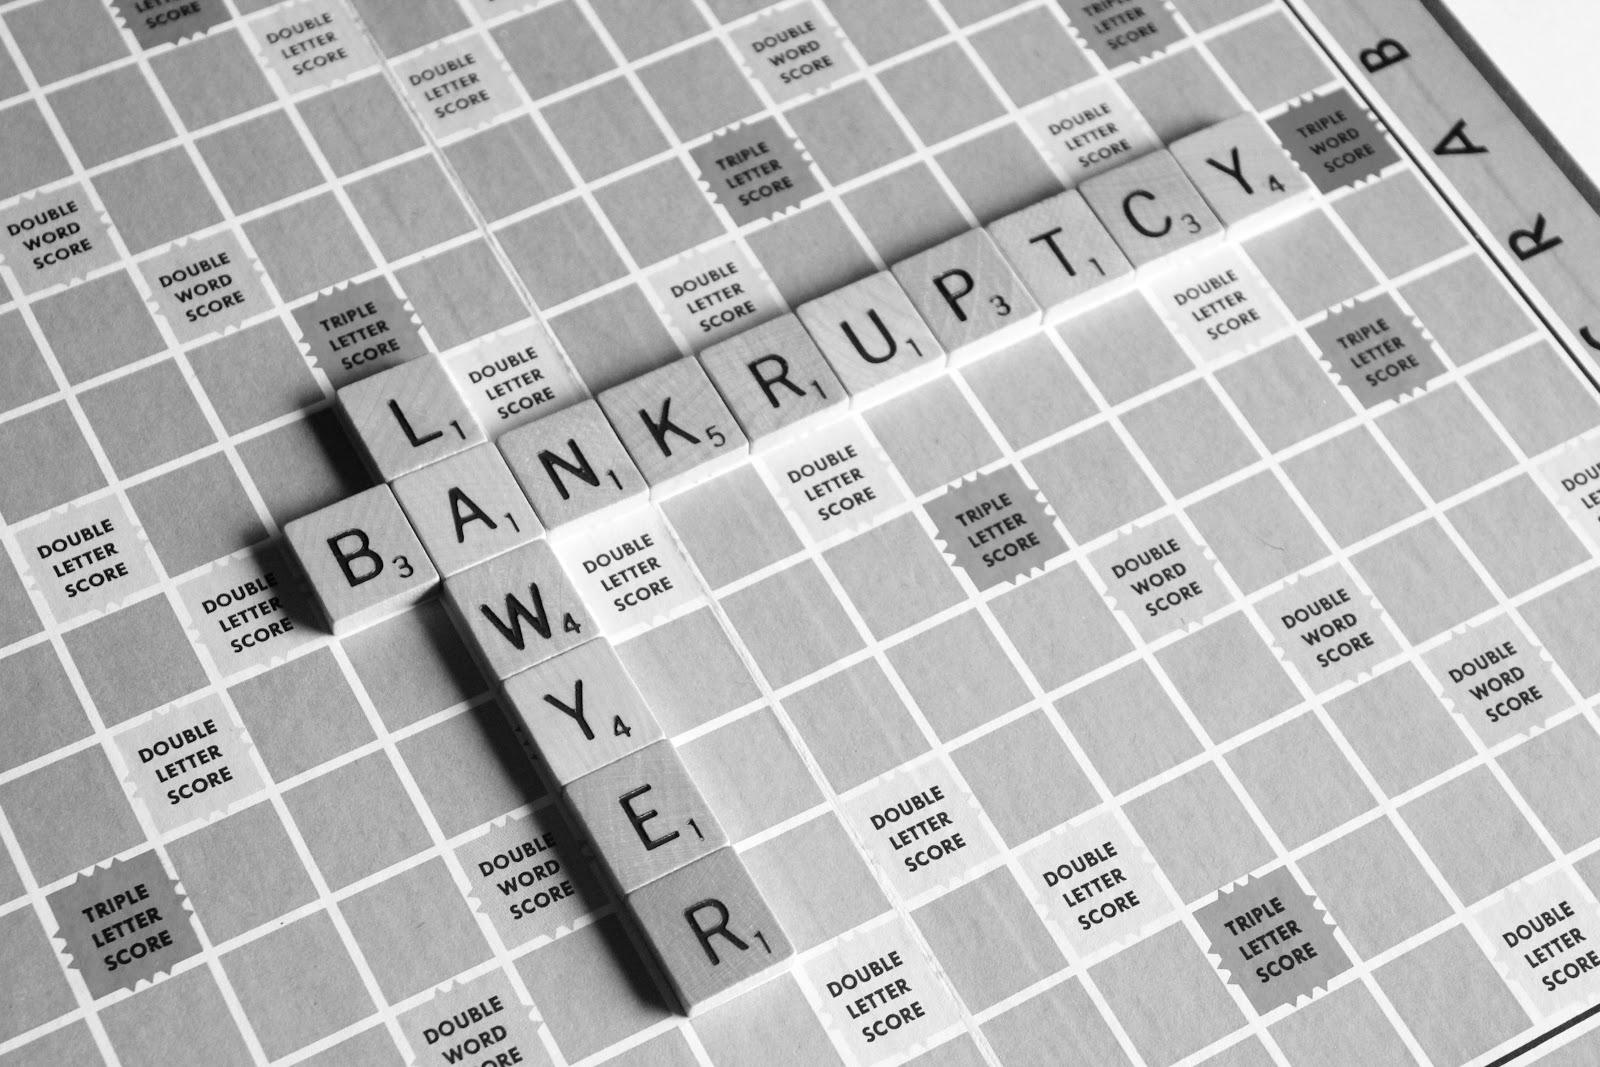 Anxiety crossword clue (150)